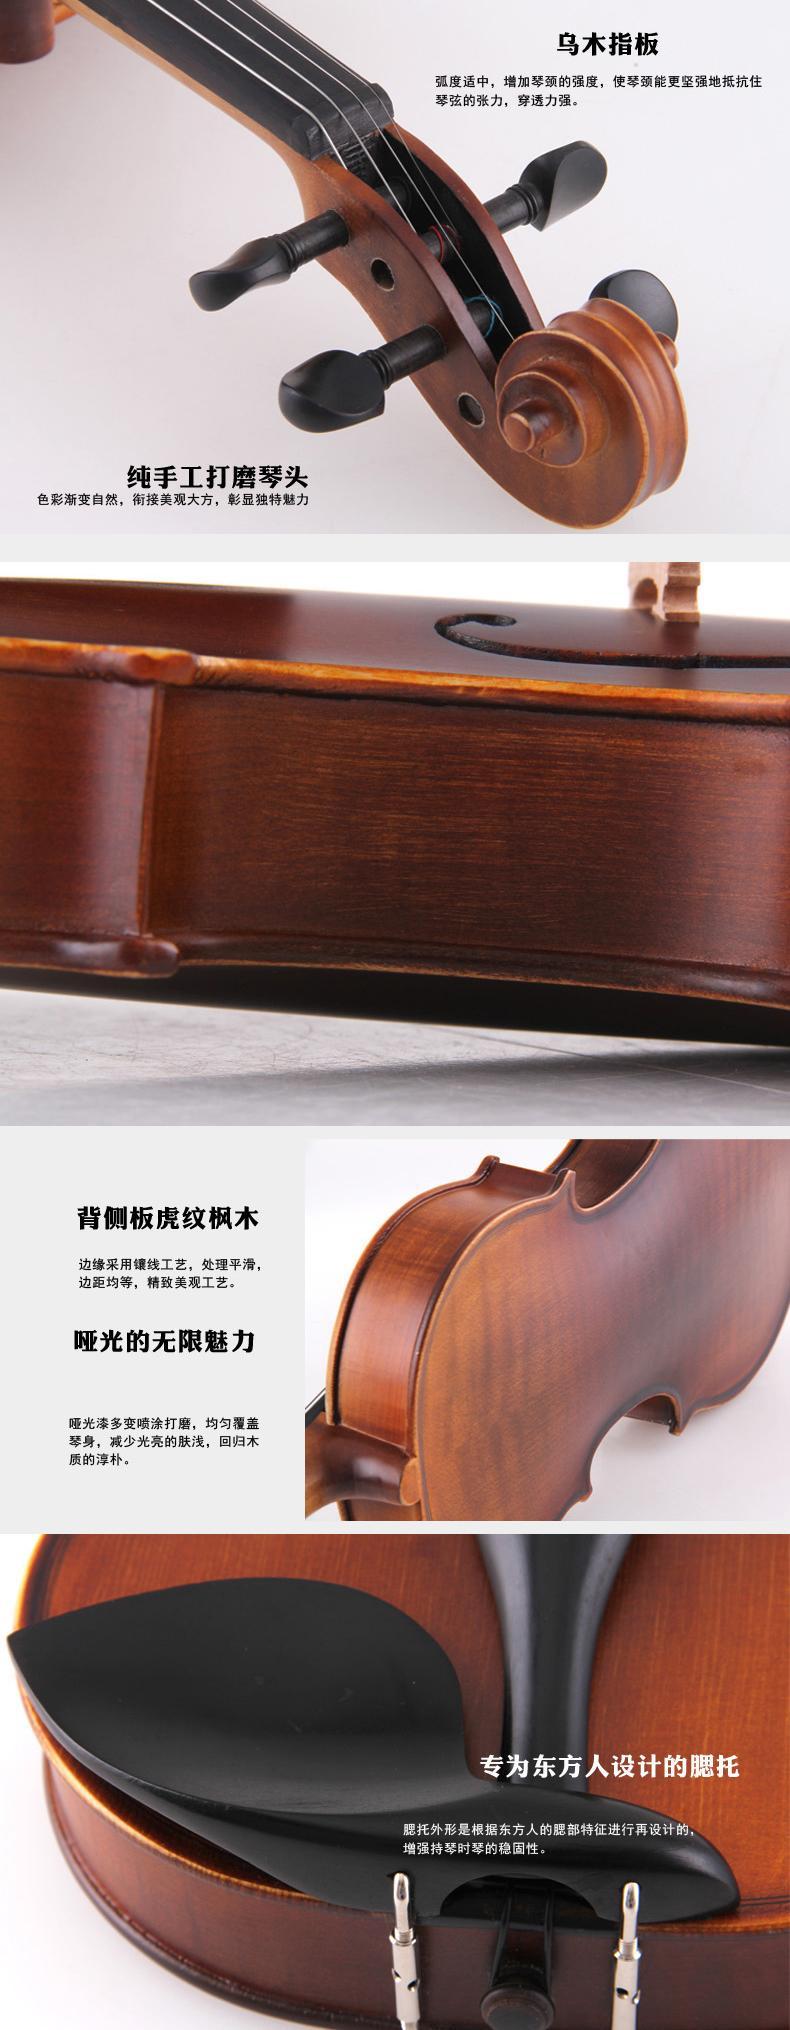 JYVL-M600 Handcraft Middle Grade Violin 11